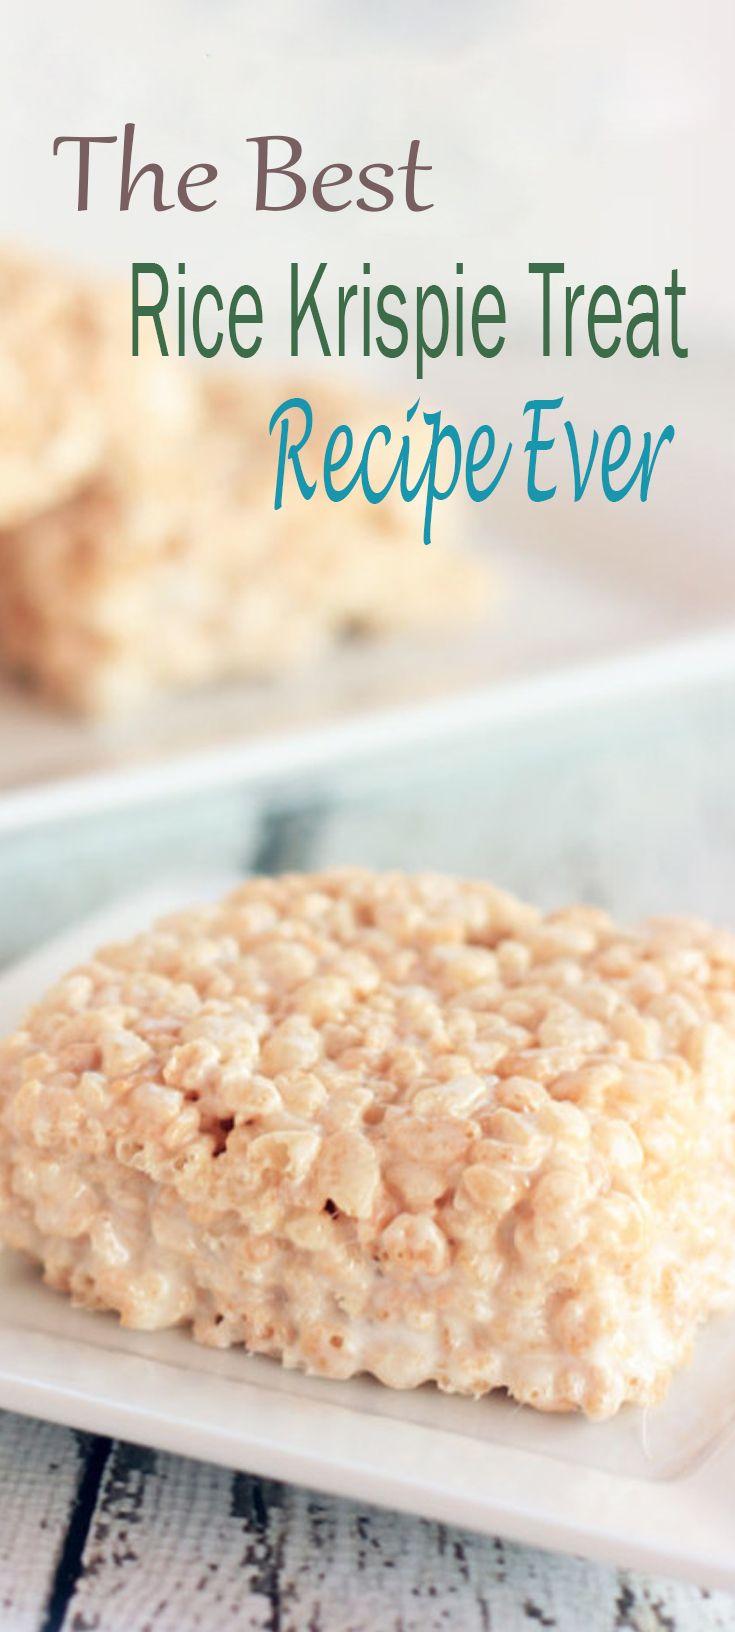 The Best Rice Krispie Treat Recipe Ever